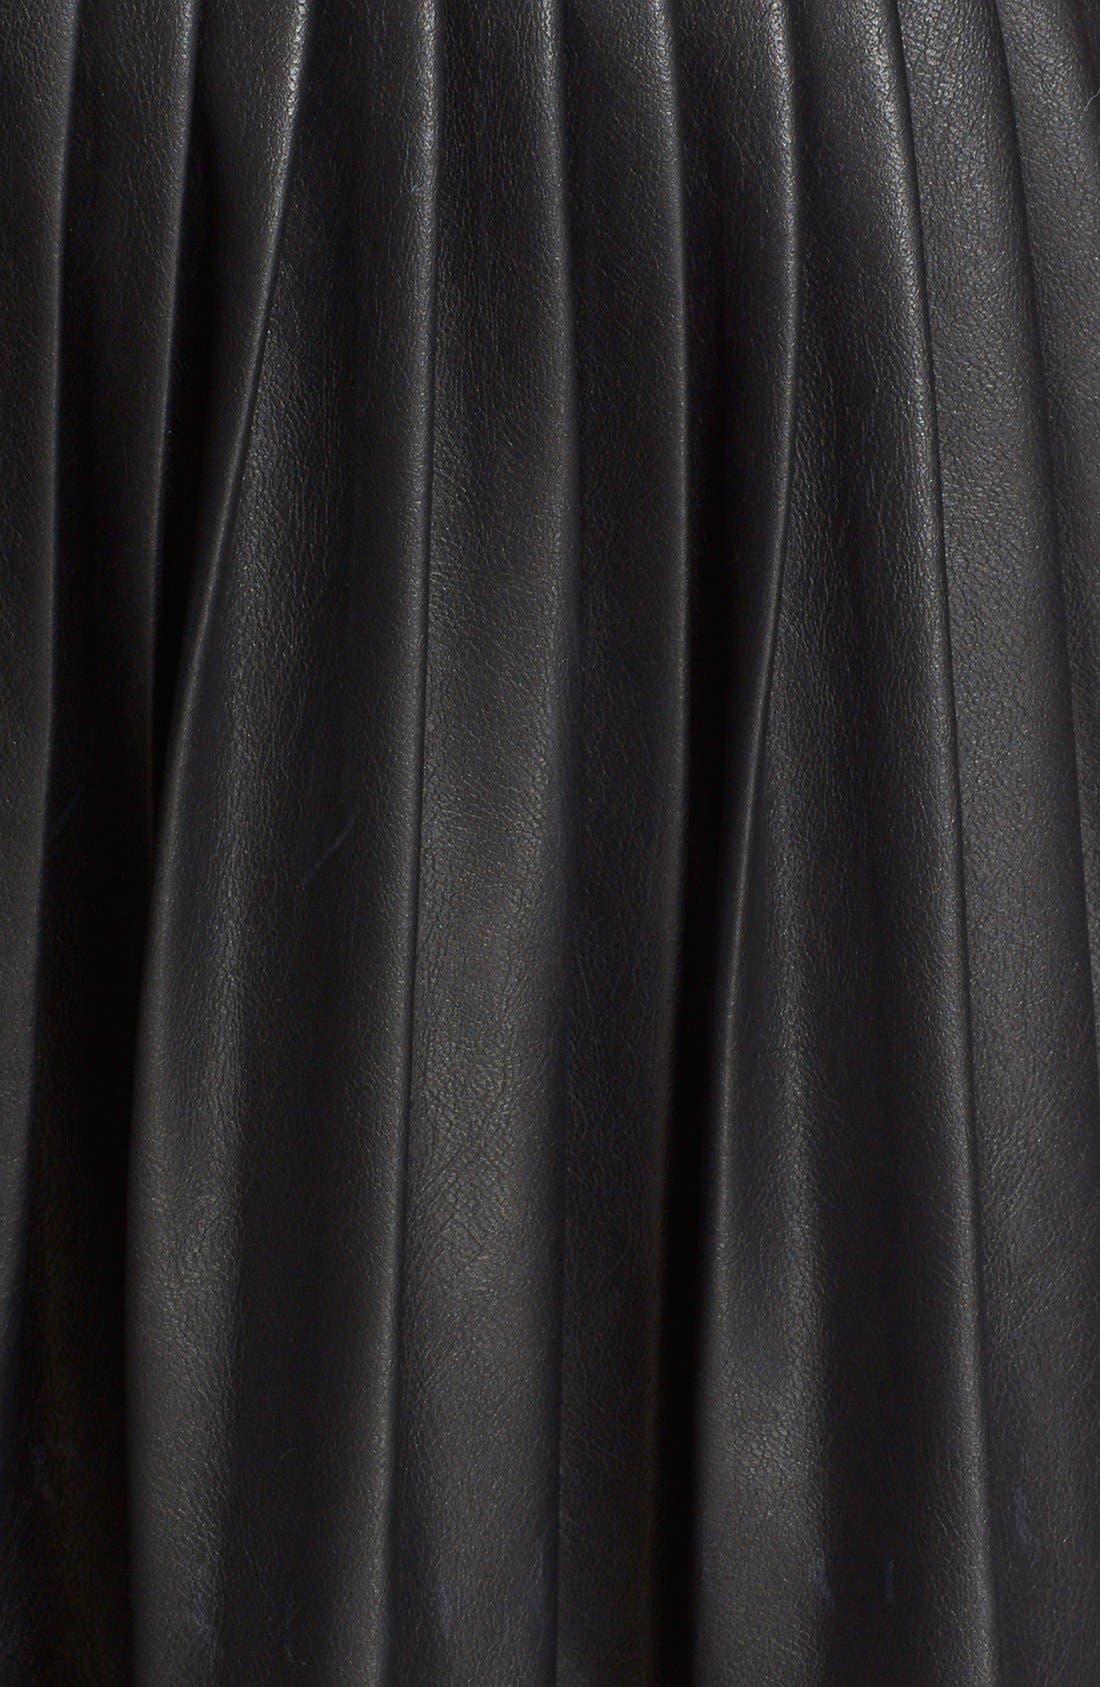 Faux Leather Pleated Drop Yoke Skirt,                             Alternate thumbnail 5, color,                             Black